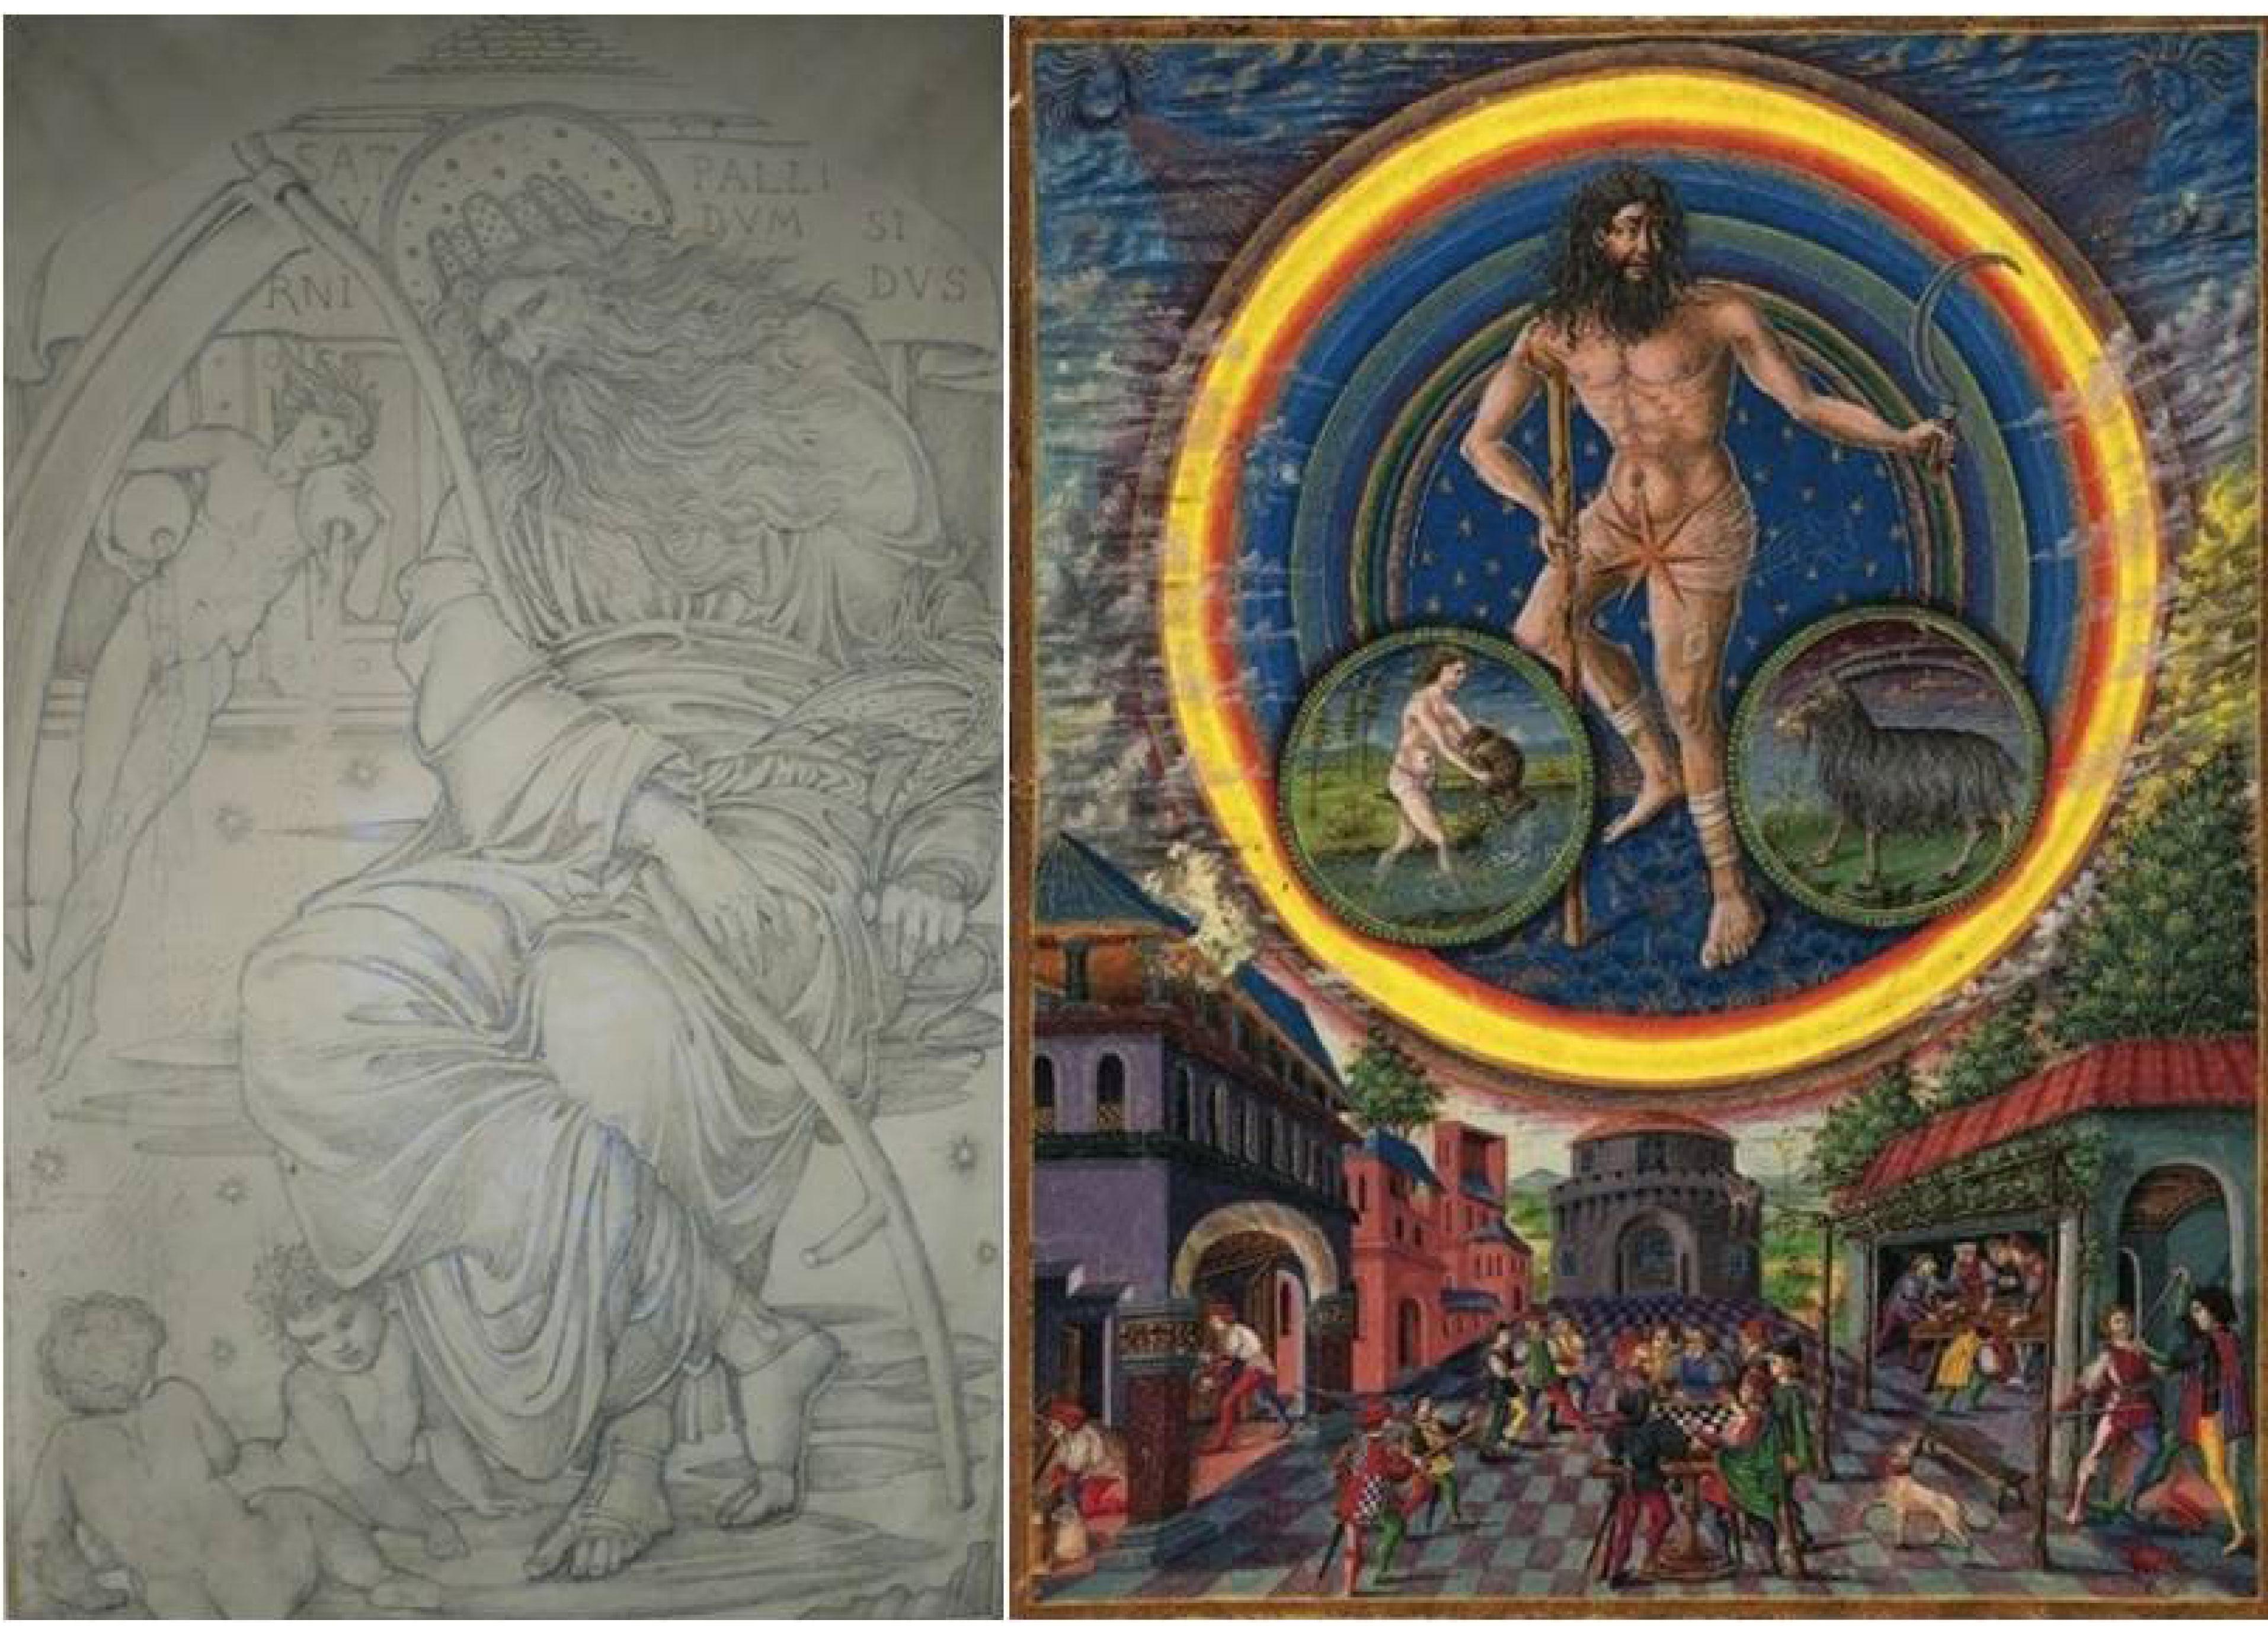 Edward Burne-Jones 1878 design for Saturn stained glass panel and medieval Saturn from De Sphaera Mundi